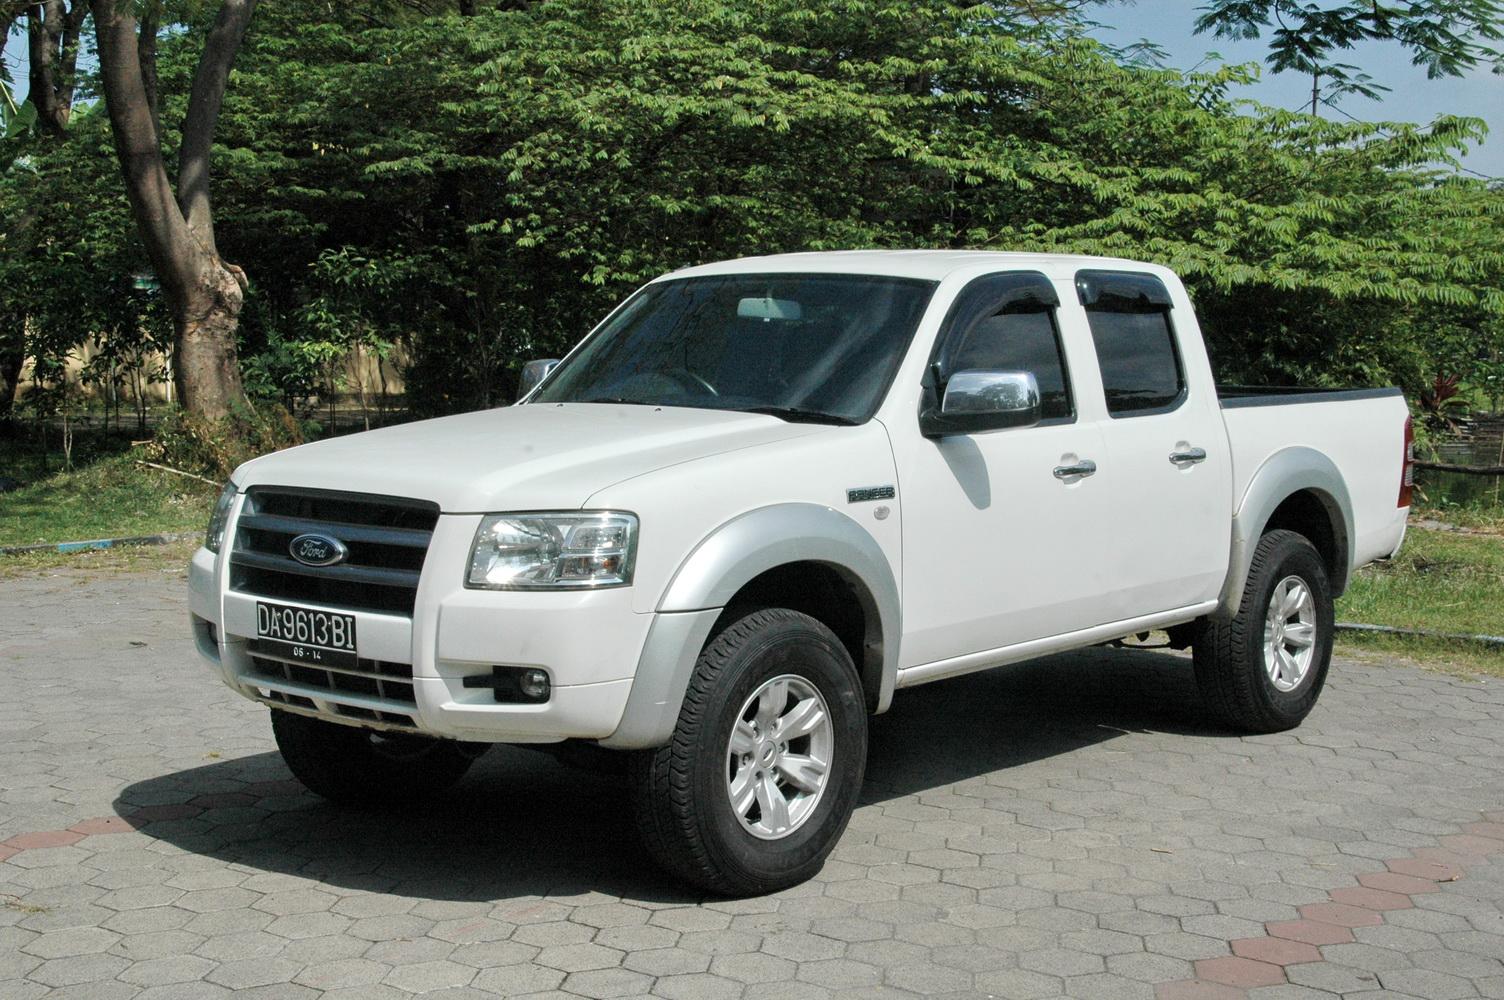 automoda: ford ranger 2008 xlt doublecabin 4x4